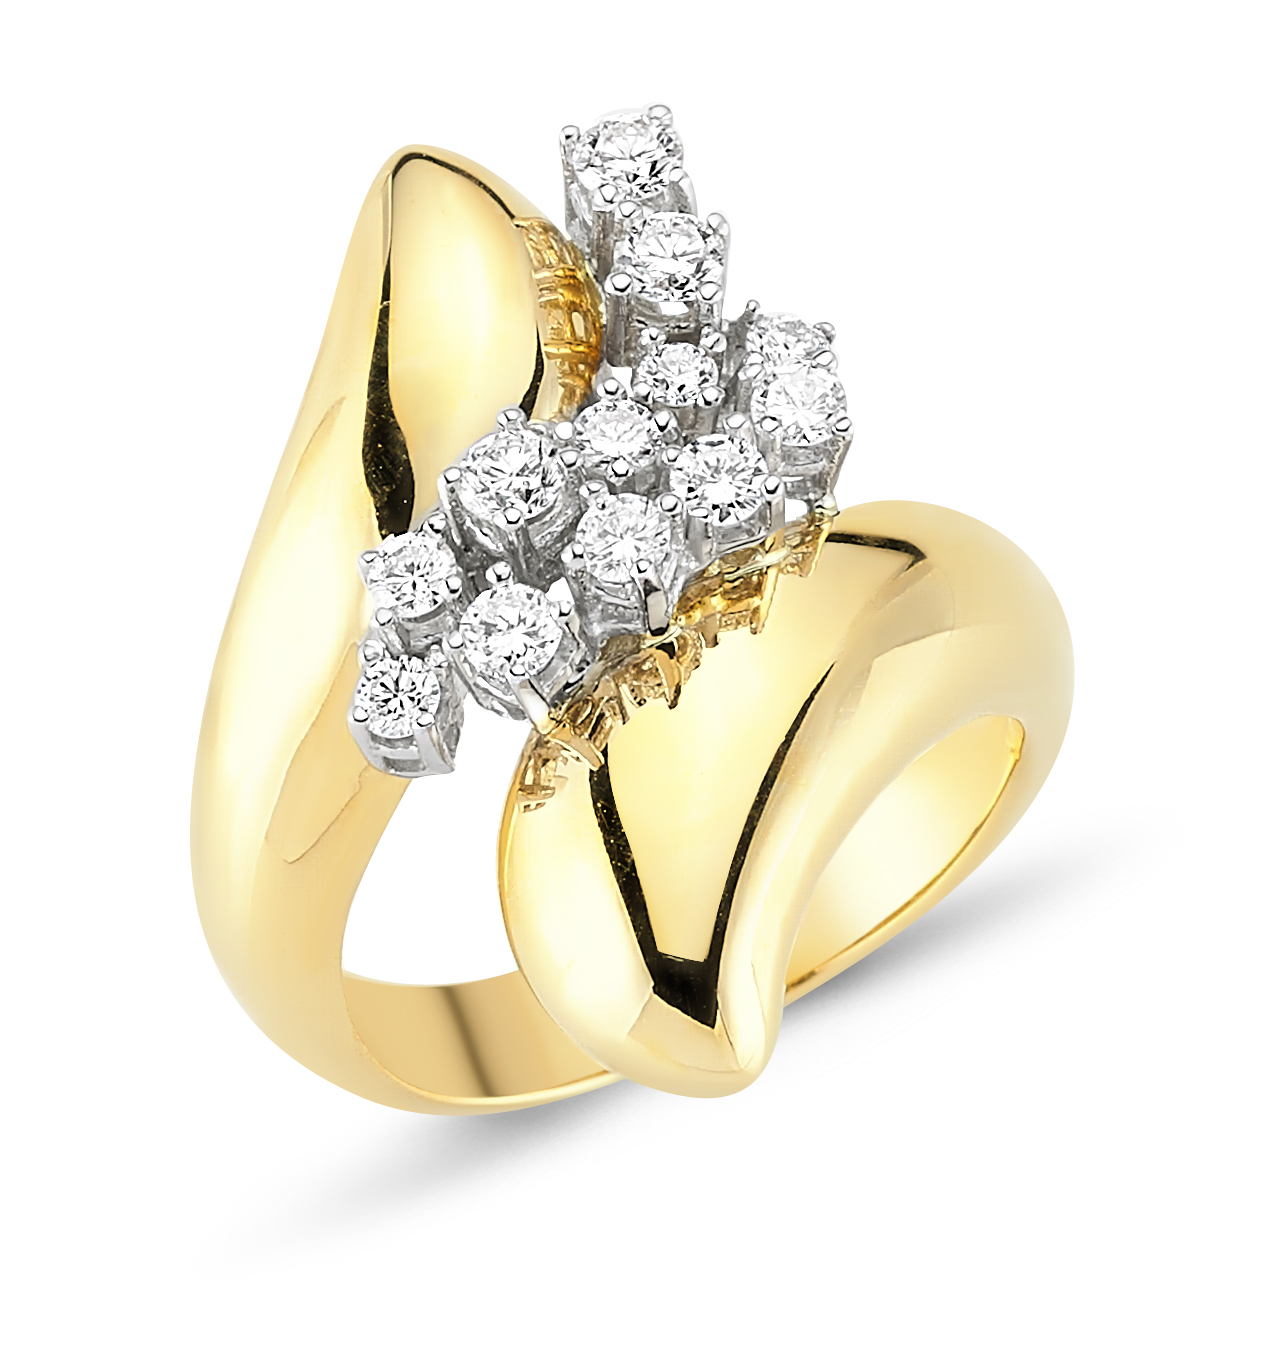 Pırlantalı Altın Yüzük - 6002716